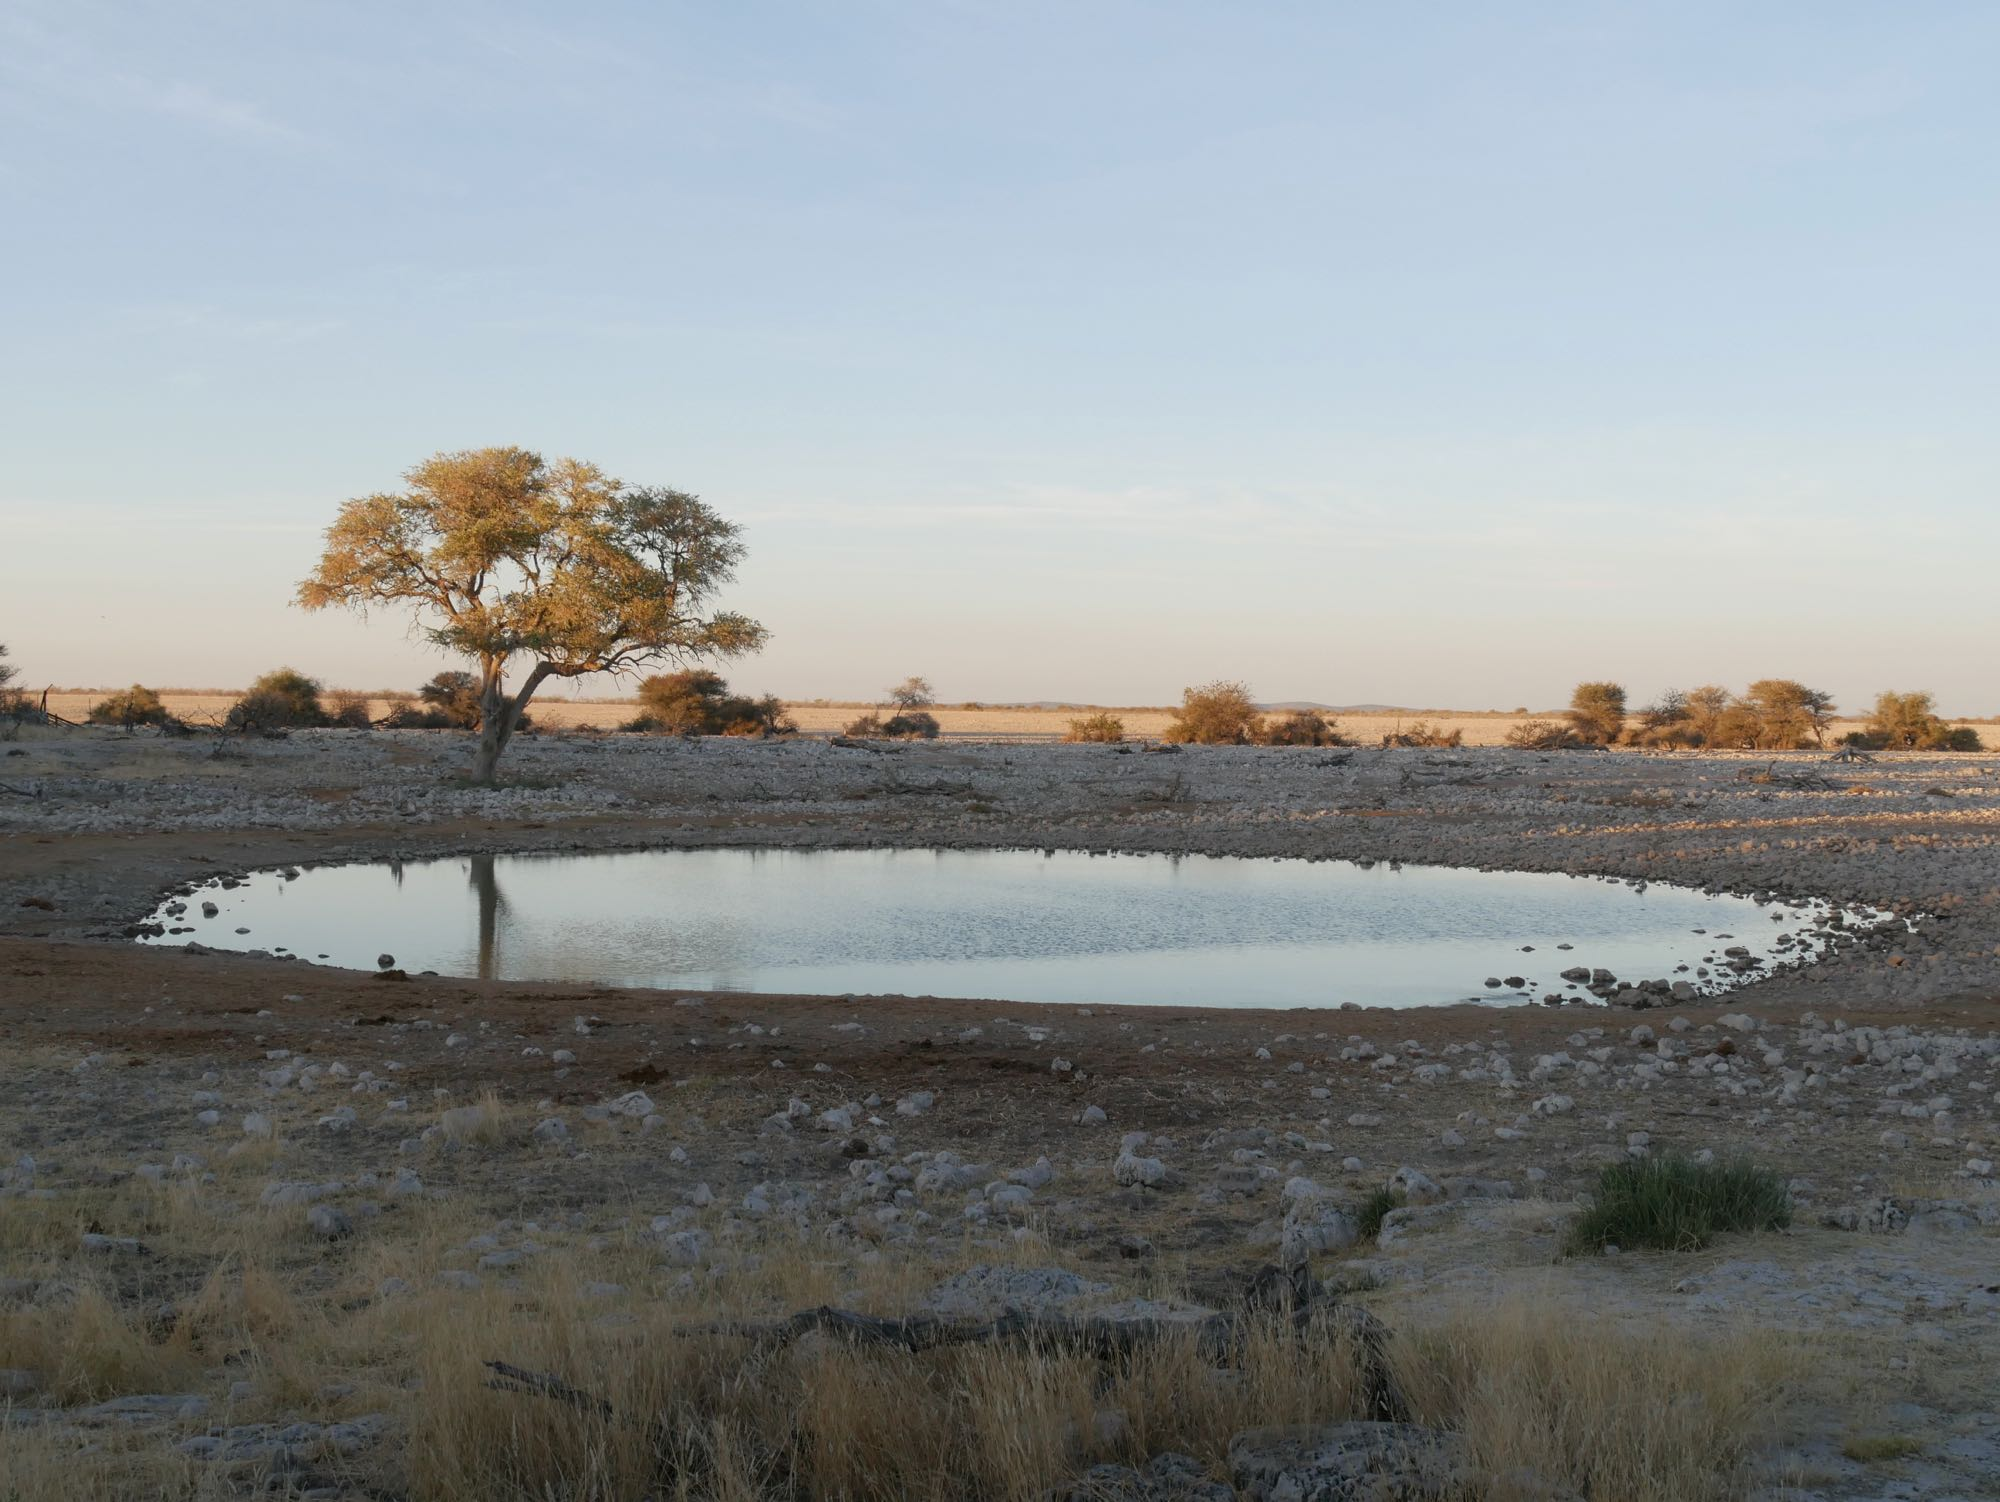 Trou d'eau d'Okaukuejo à Etosha